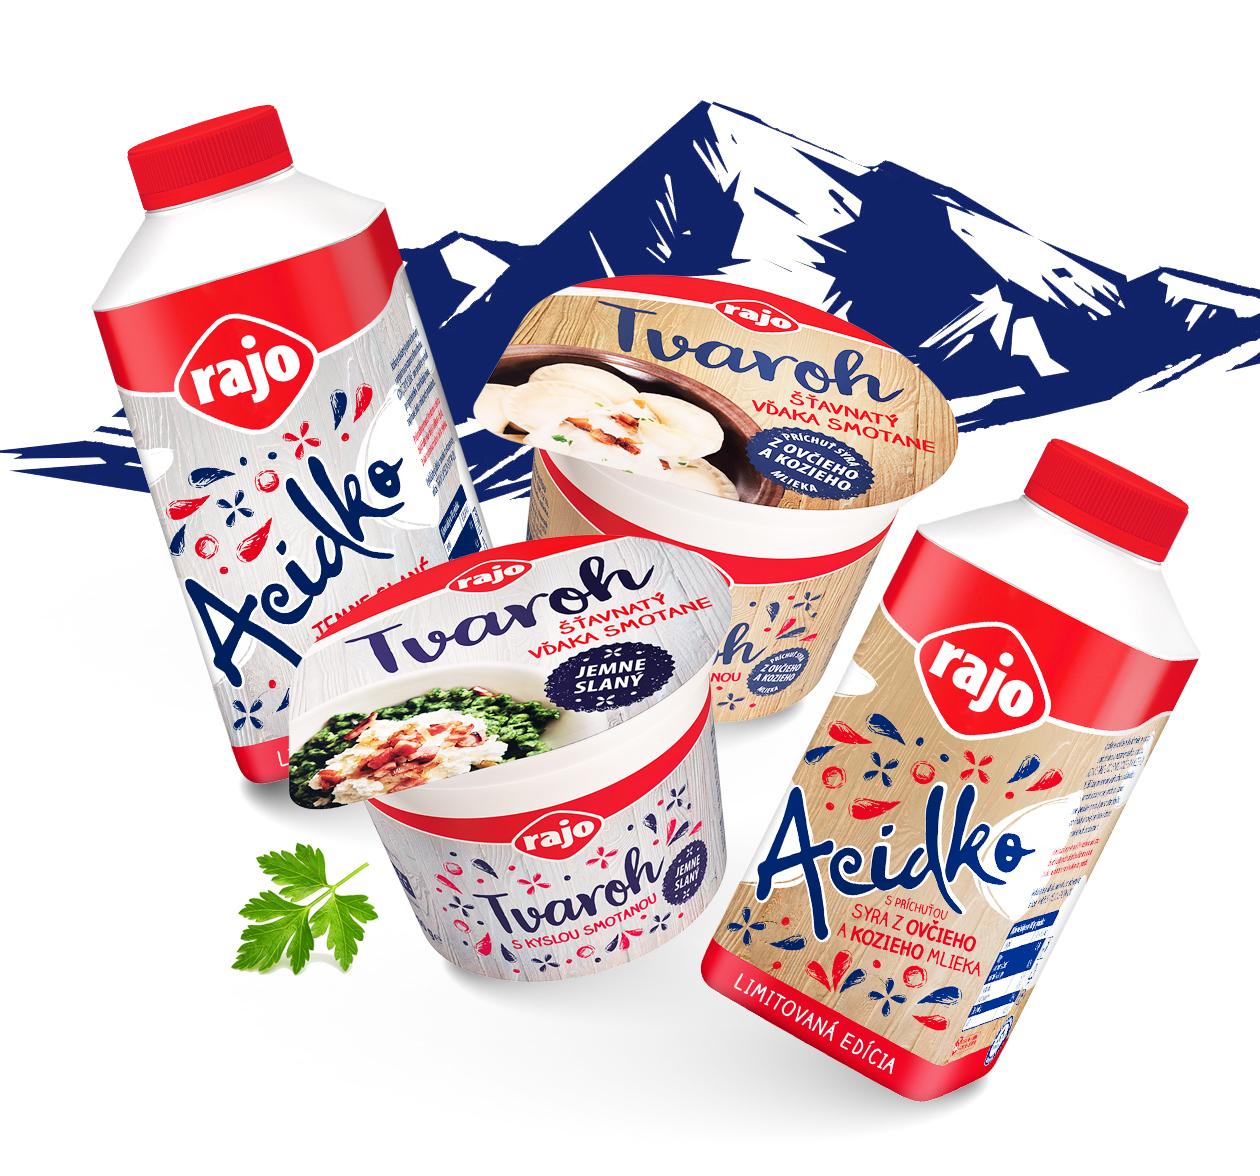 packaging rajo acidko tvaroh slovenska edicia